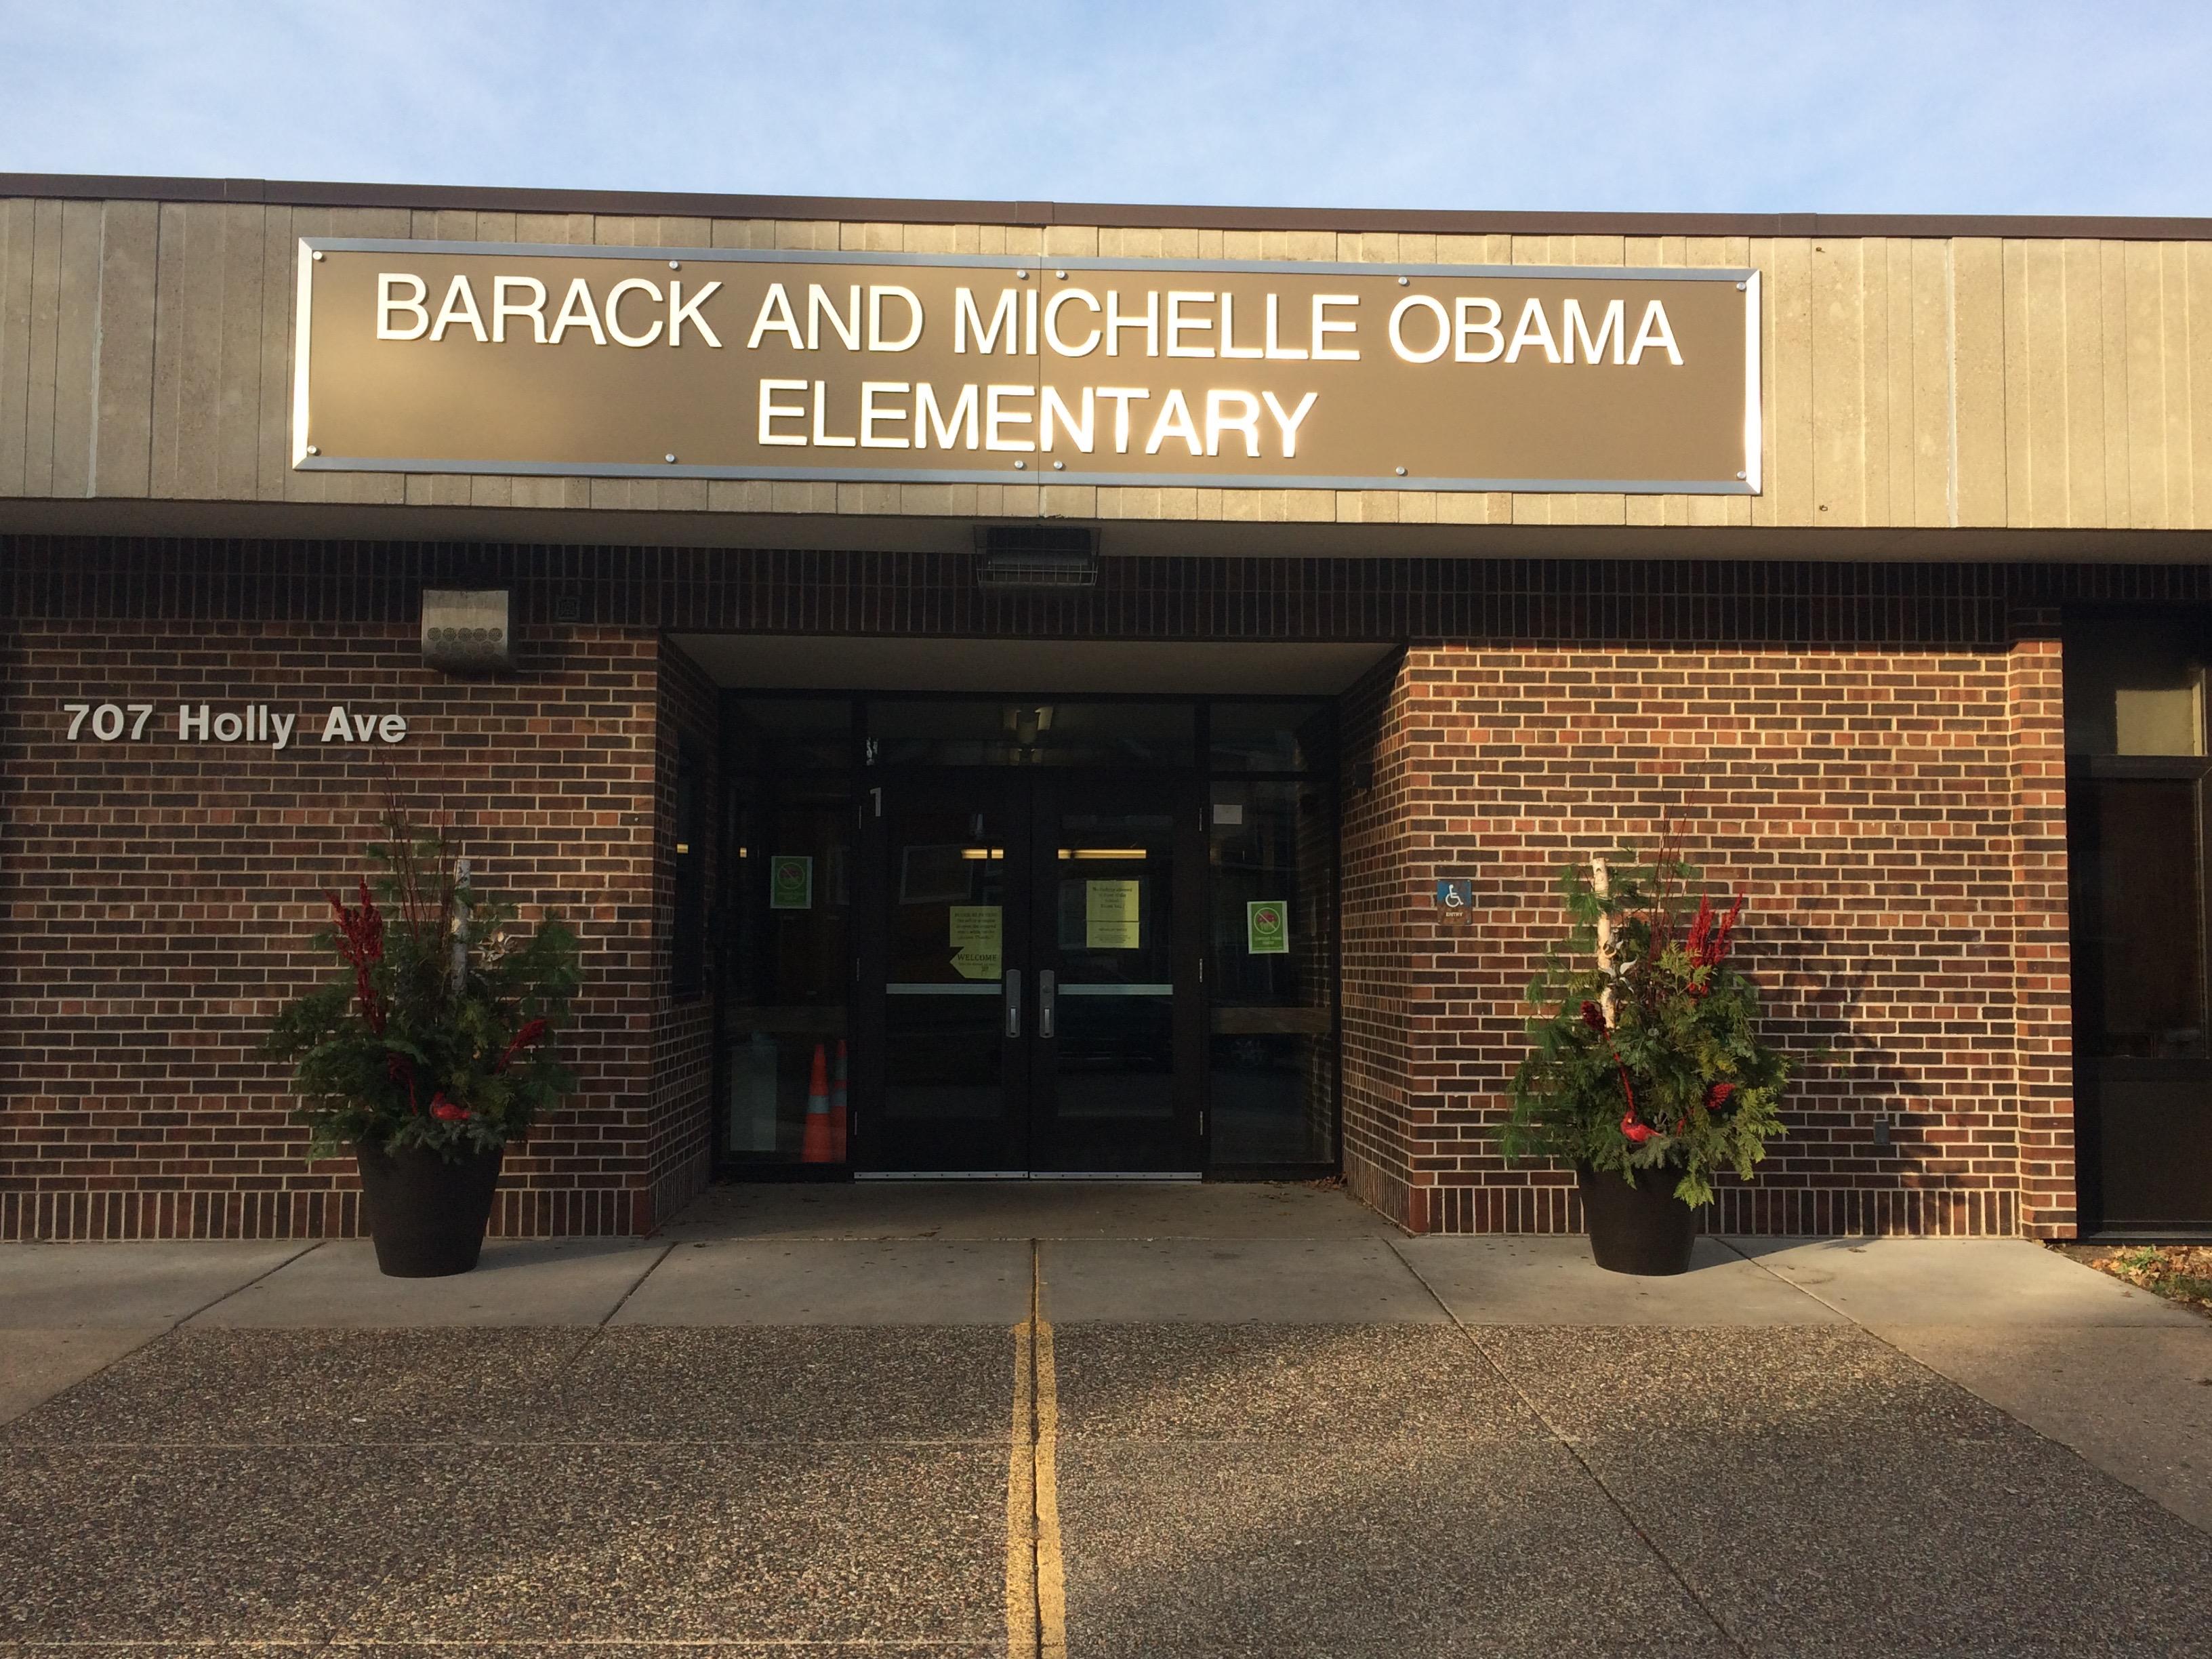 Obama Elementary School / Homepage